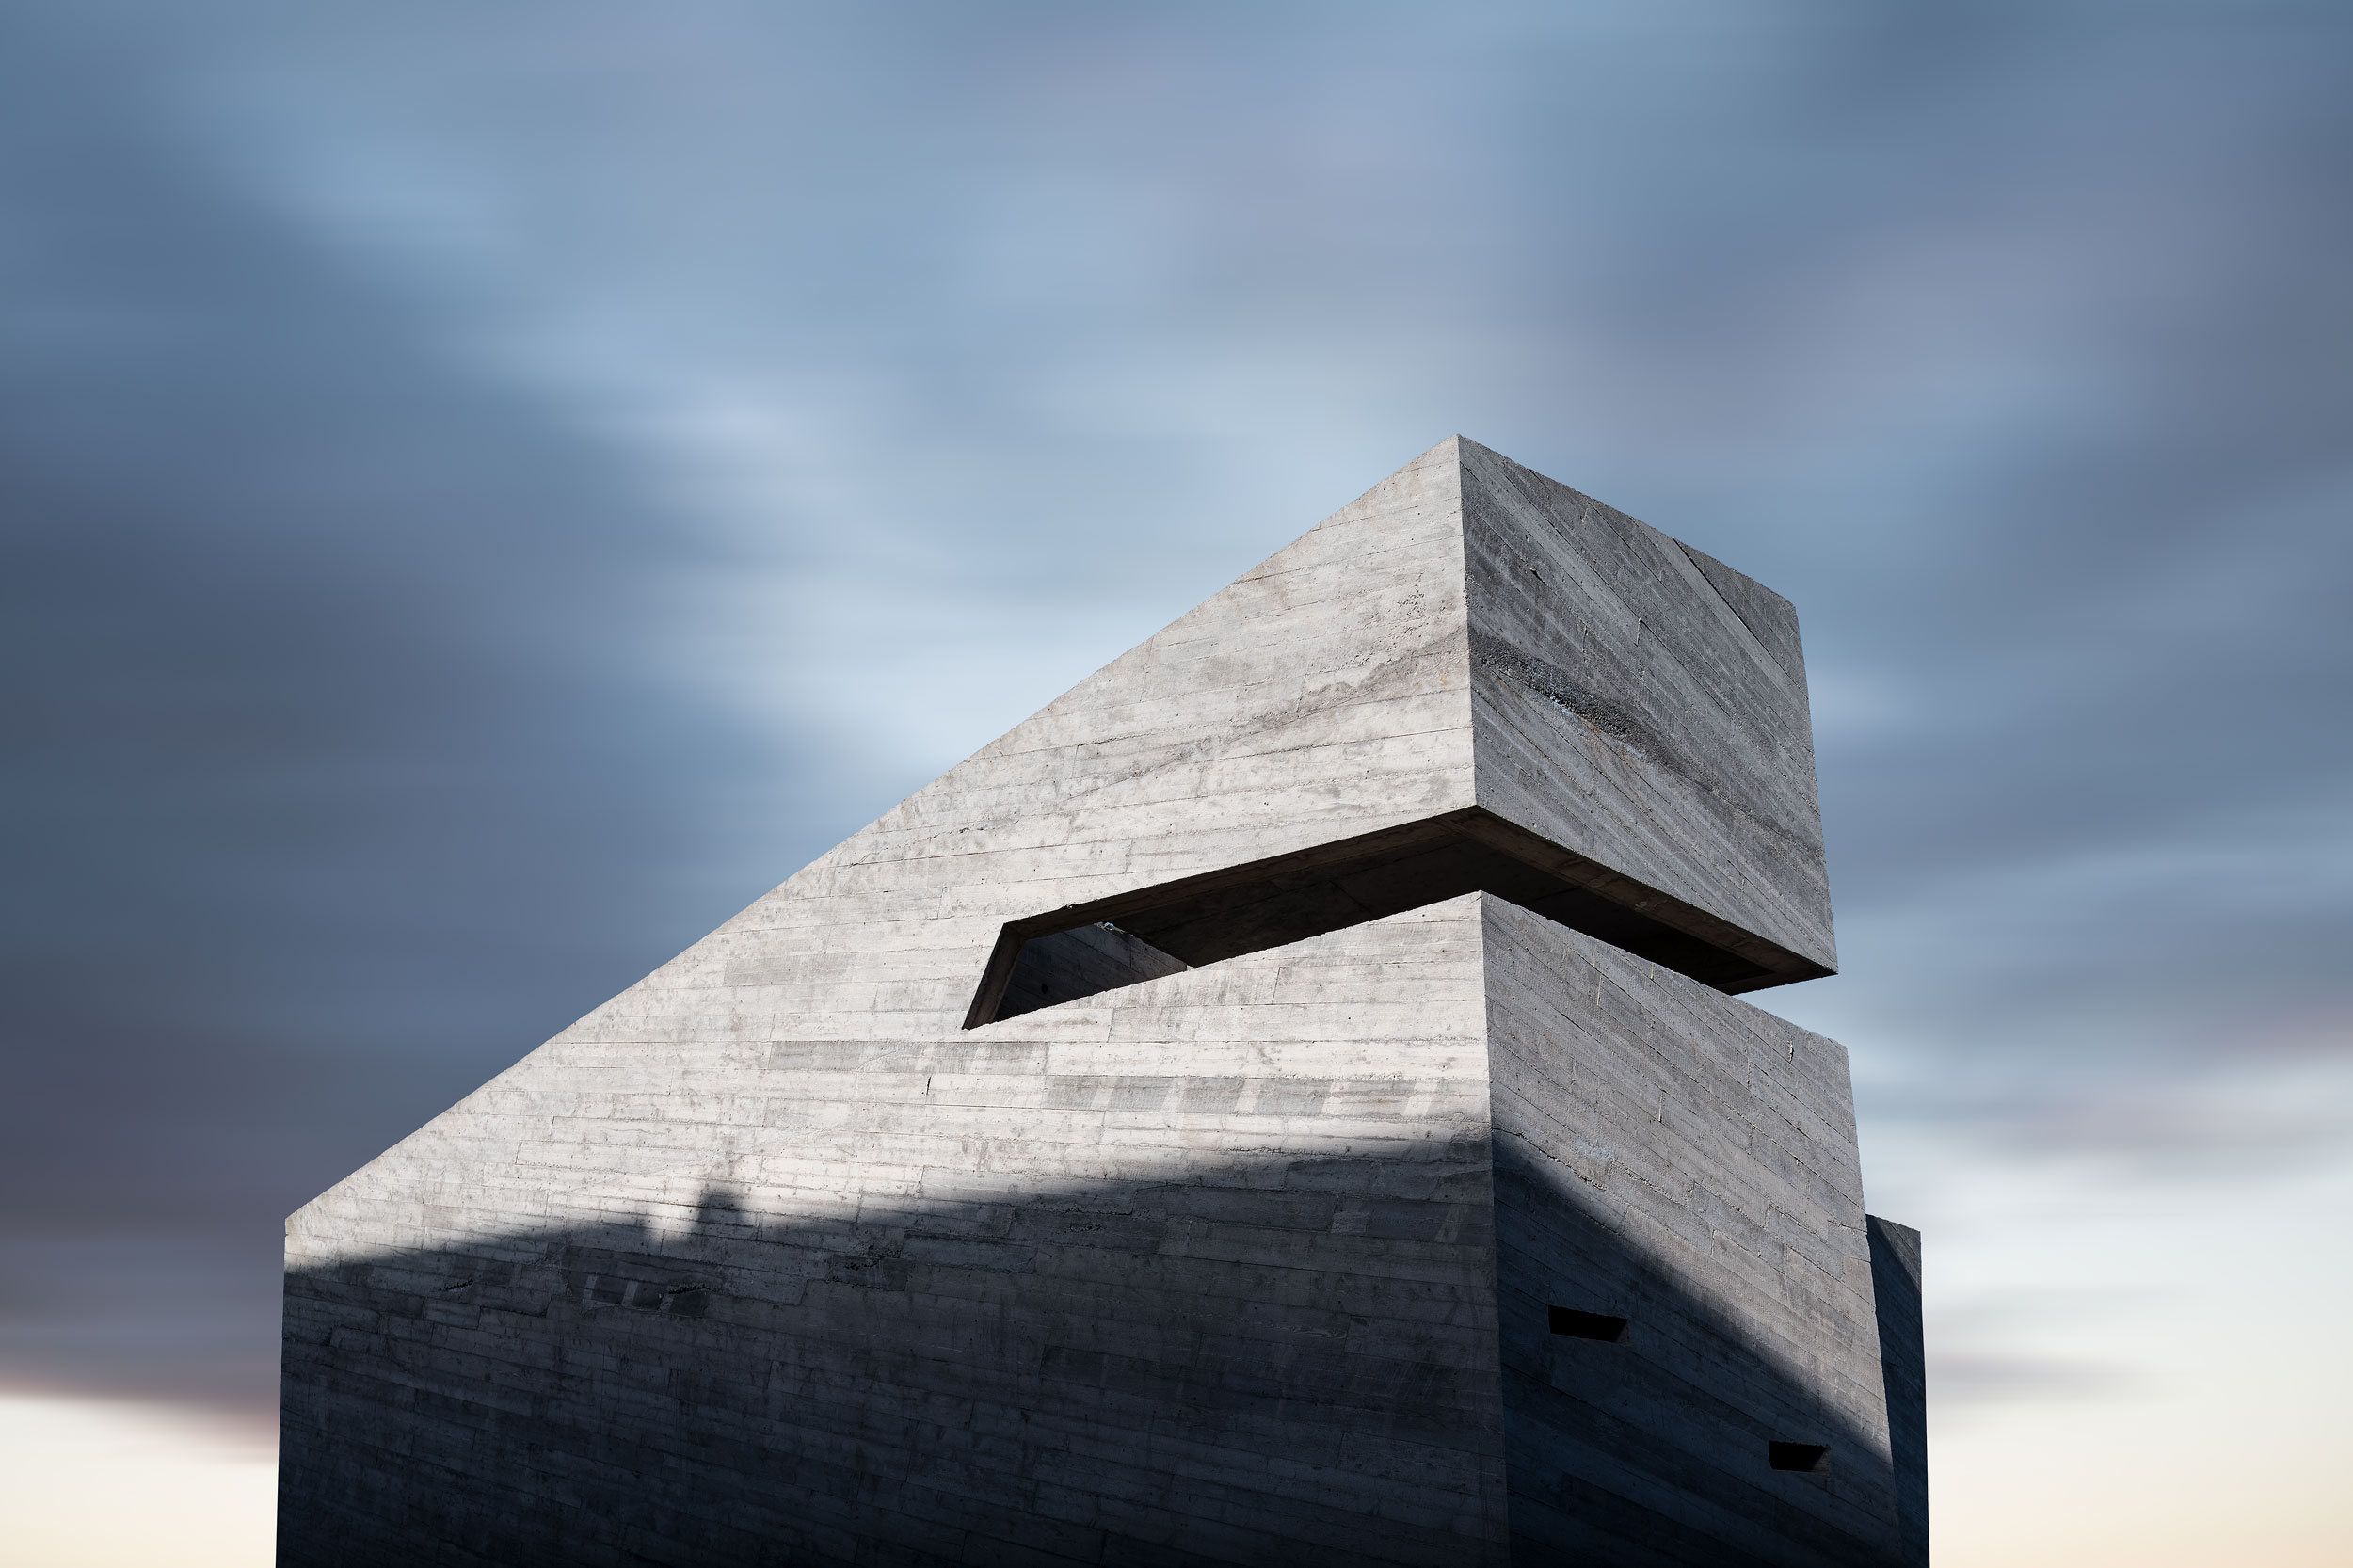 Holy Redeemer Church - Tenerife, Spanje - Architectuur fotograaf Chiel de Nooyer